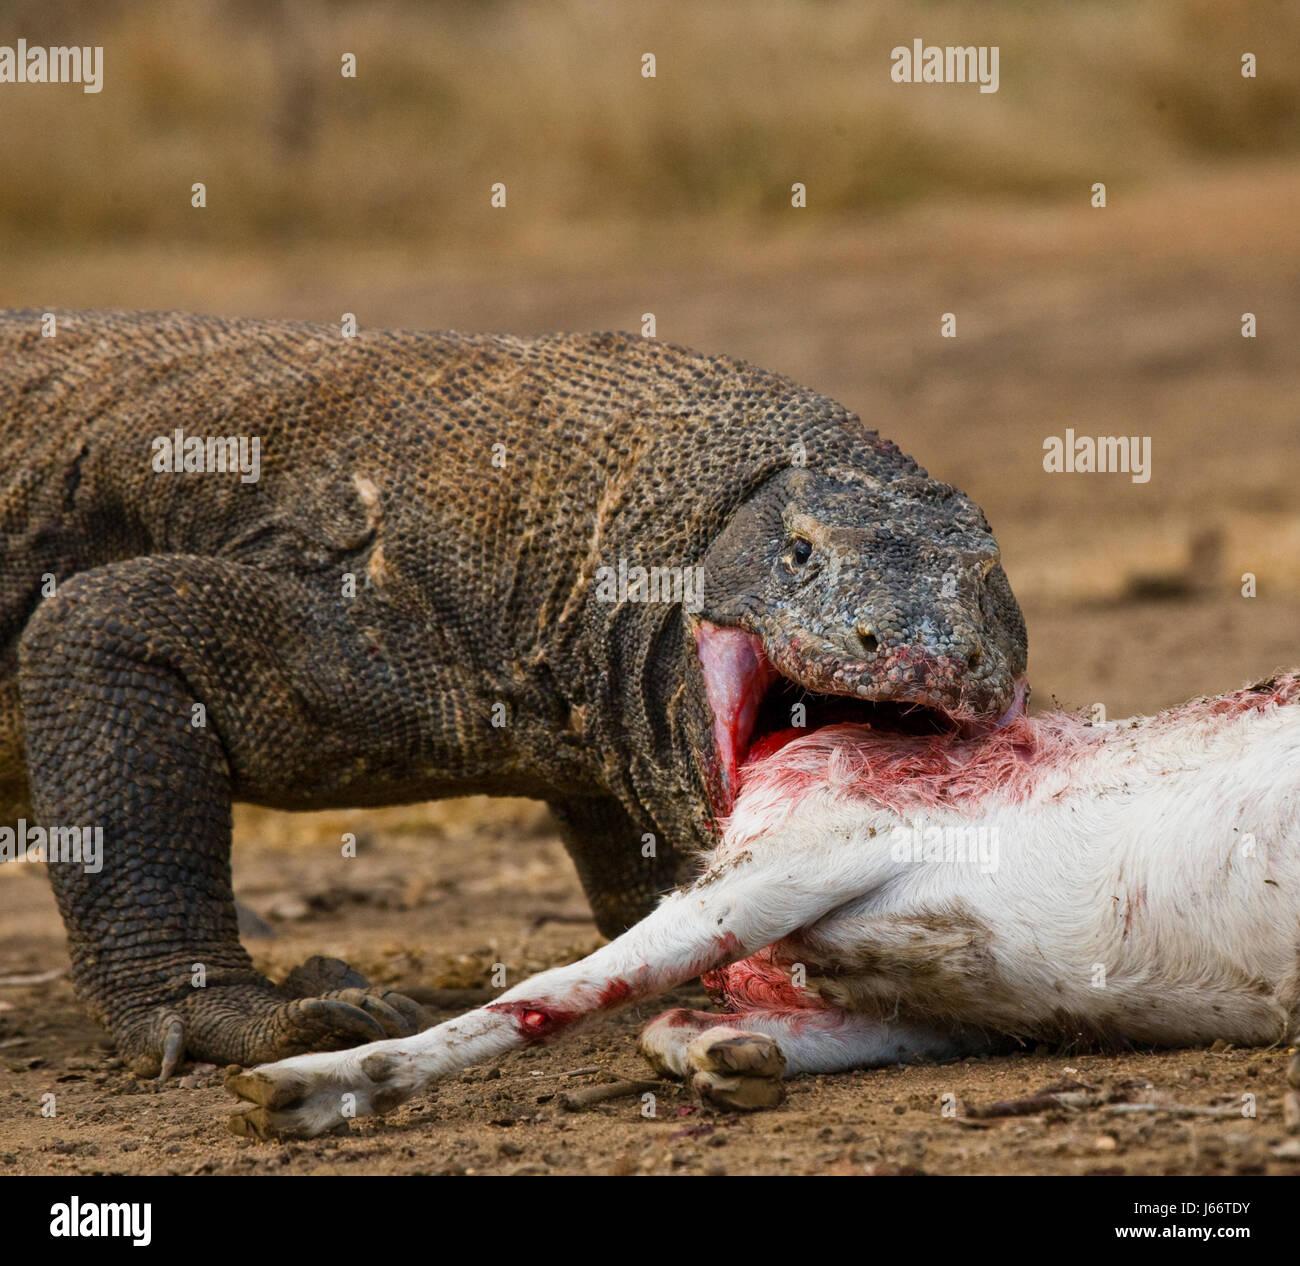 Komodo dragons eat their prey. Indonesia. Komodo National Park. An excellent illustration. - Stock Image